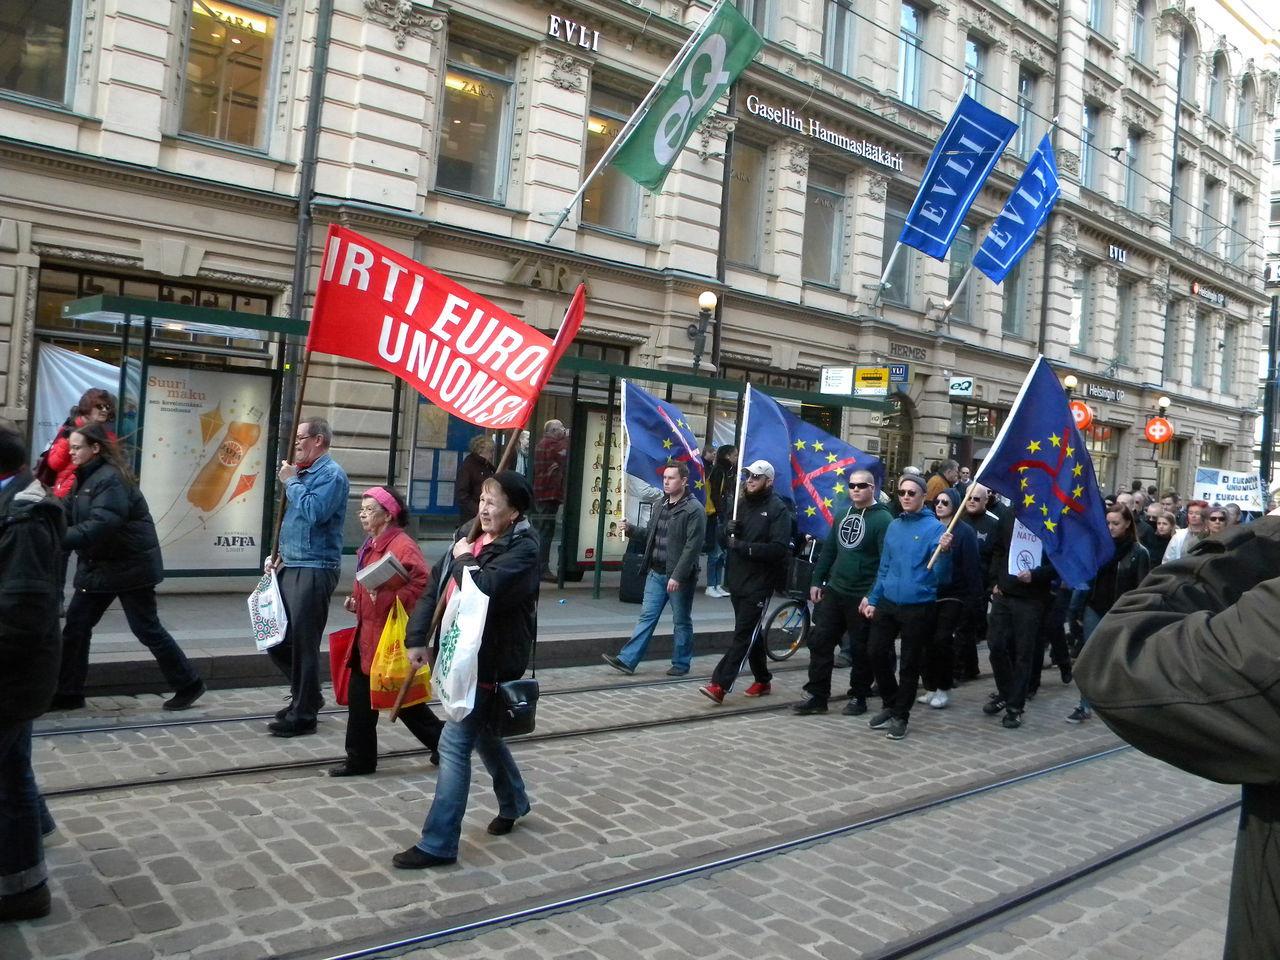 UK_EU-mielenosoitus_6